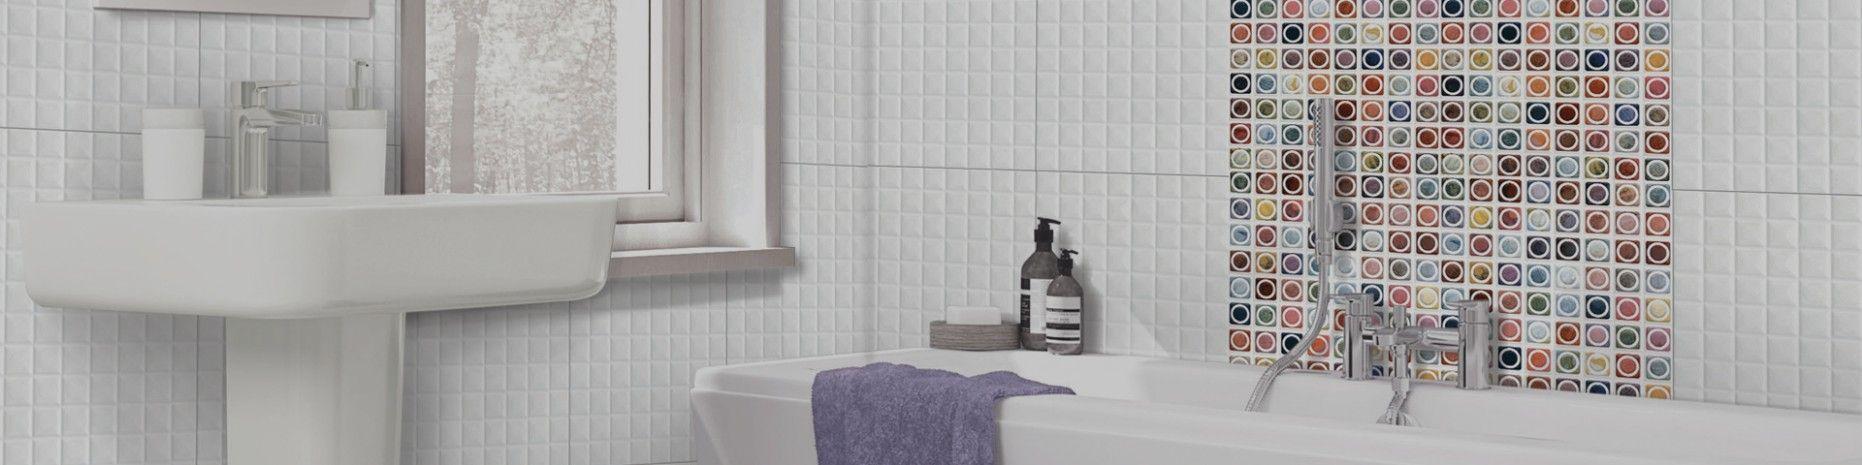 Wood Tile For Bathroom Wall Di 2020